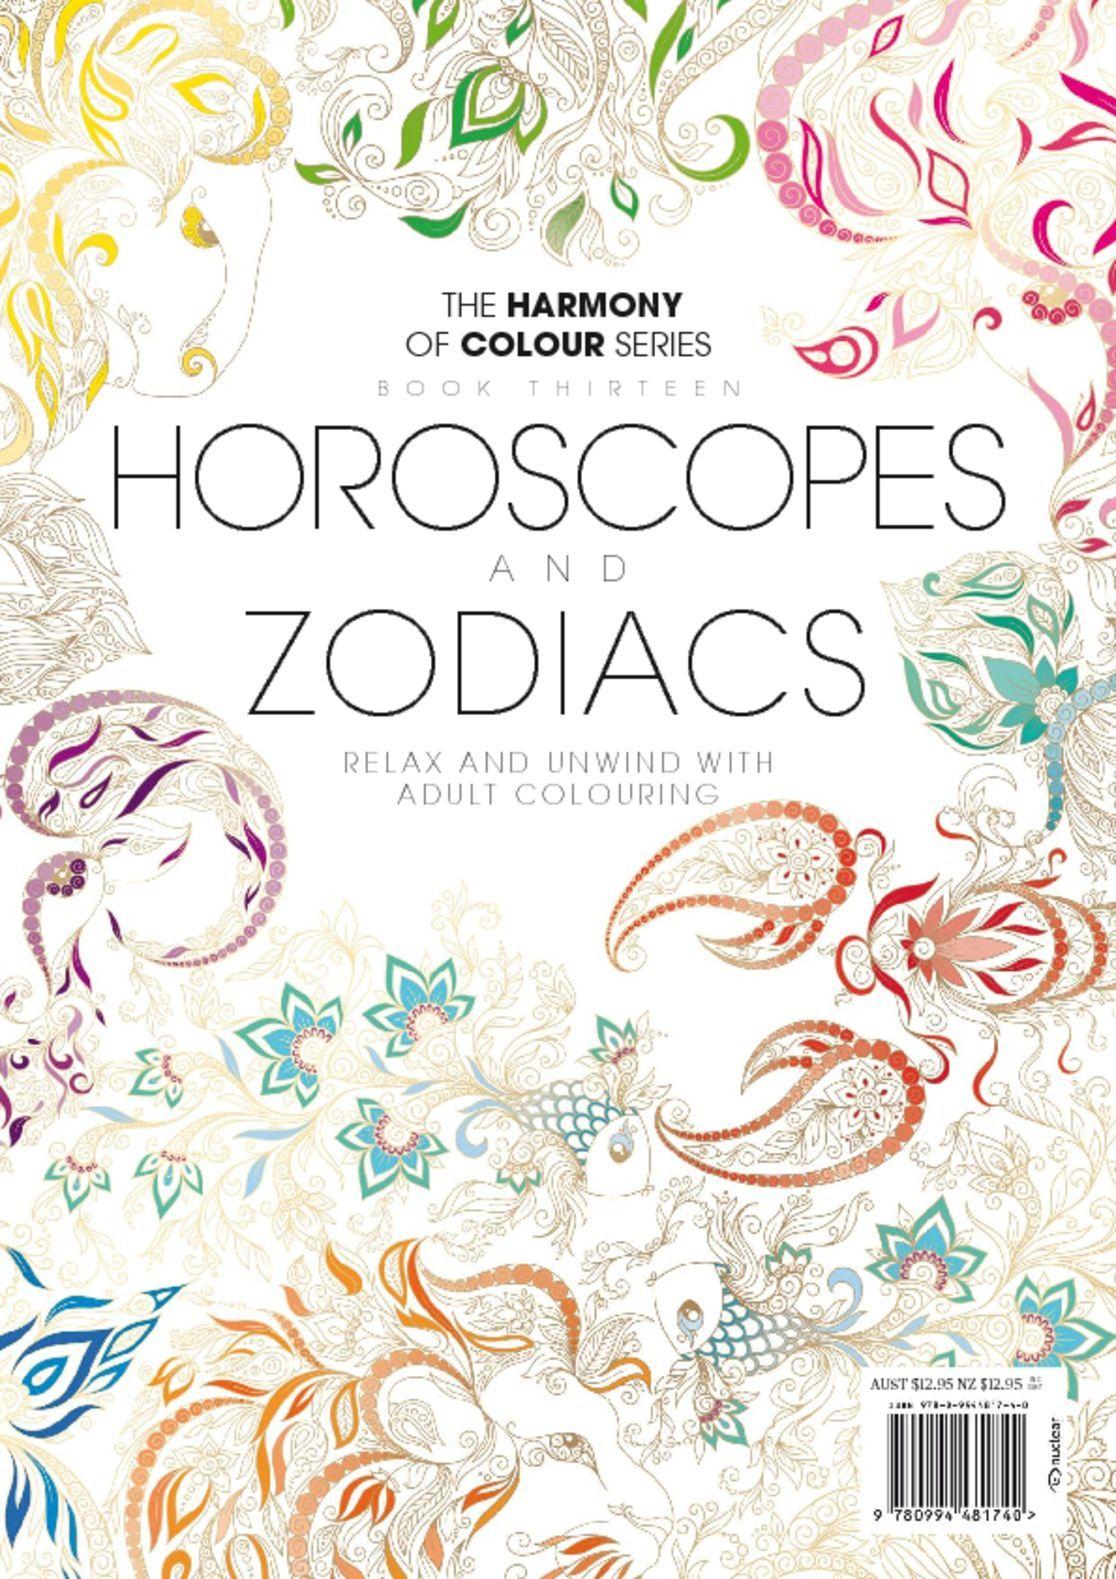 Colouring book horoscopes and zodiacs digital magazine Coloring book subscription